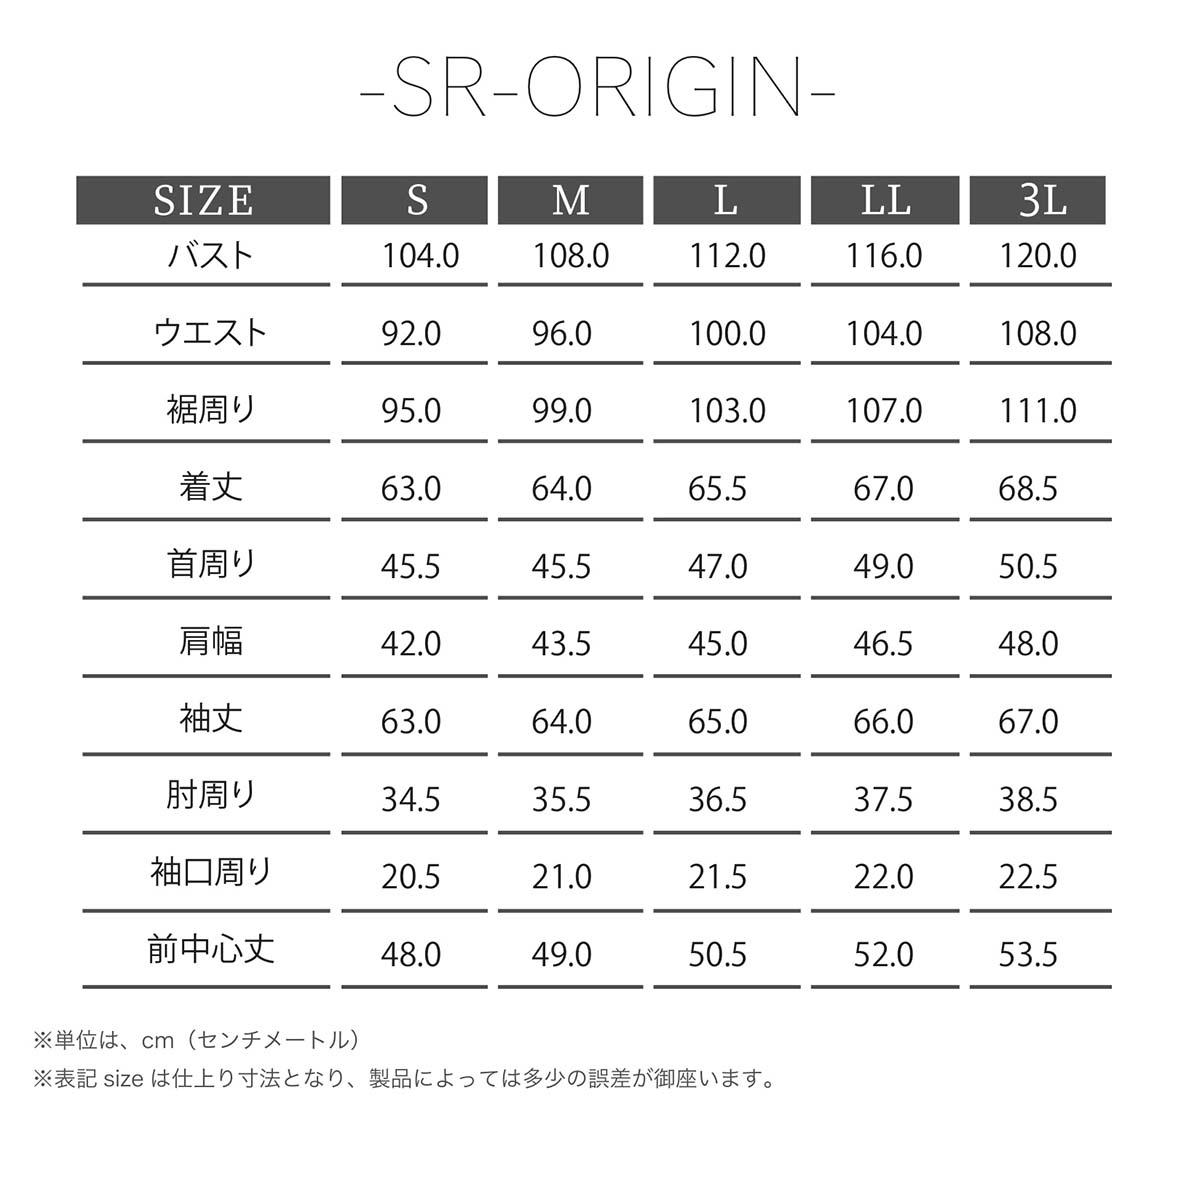 KADOYA(カドヤ) K'S LEATHER SR-ORIGIN シングルライダース ブラック